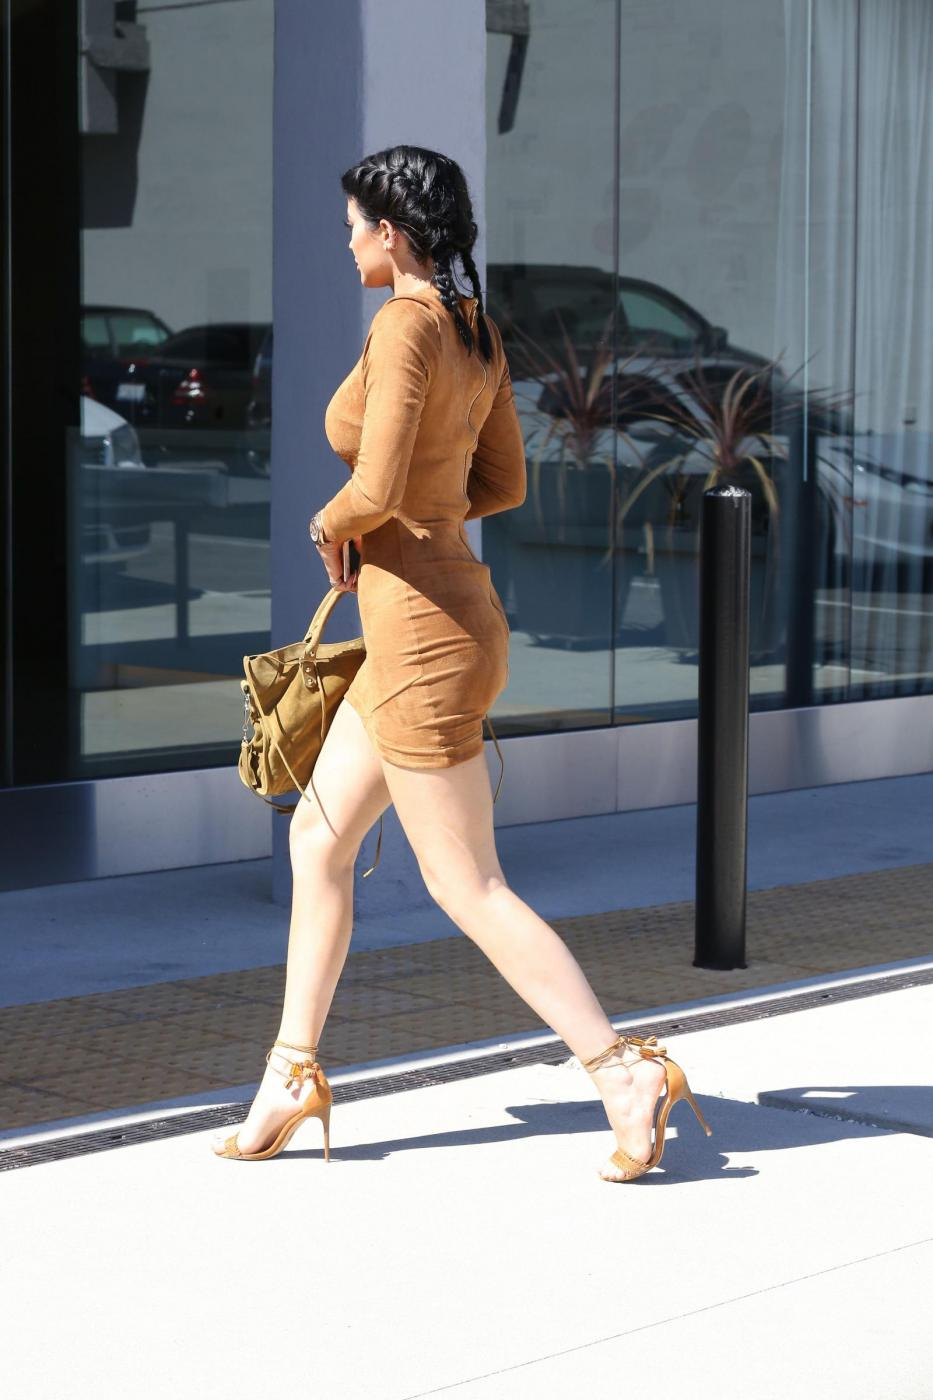 Kylie Jenner sexy: miniabito, trucco da Barbie e Ferrari7